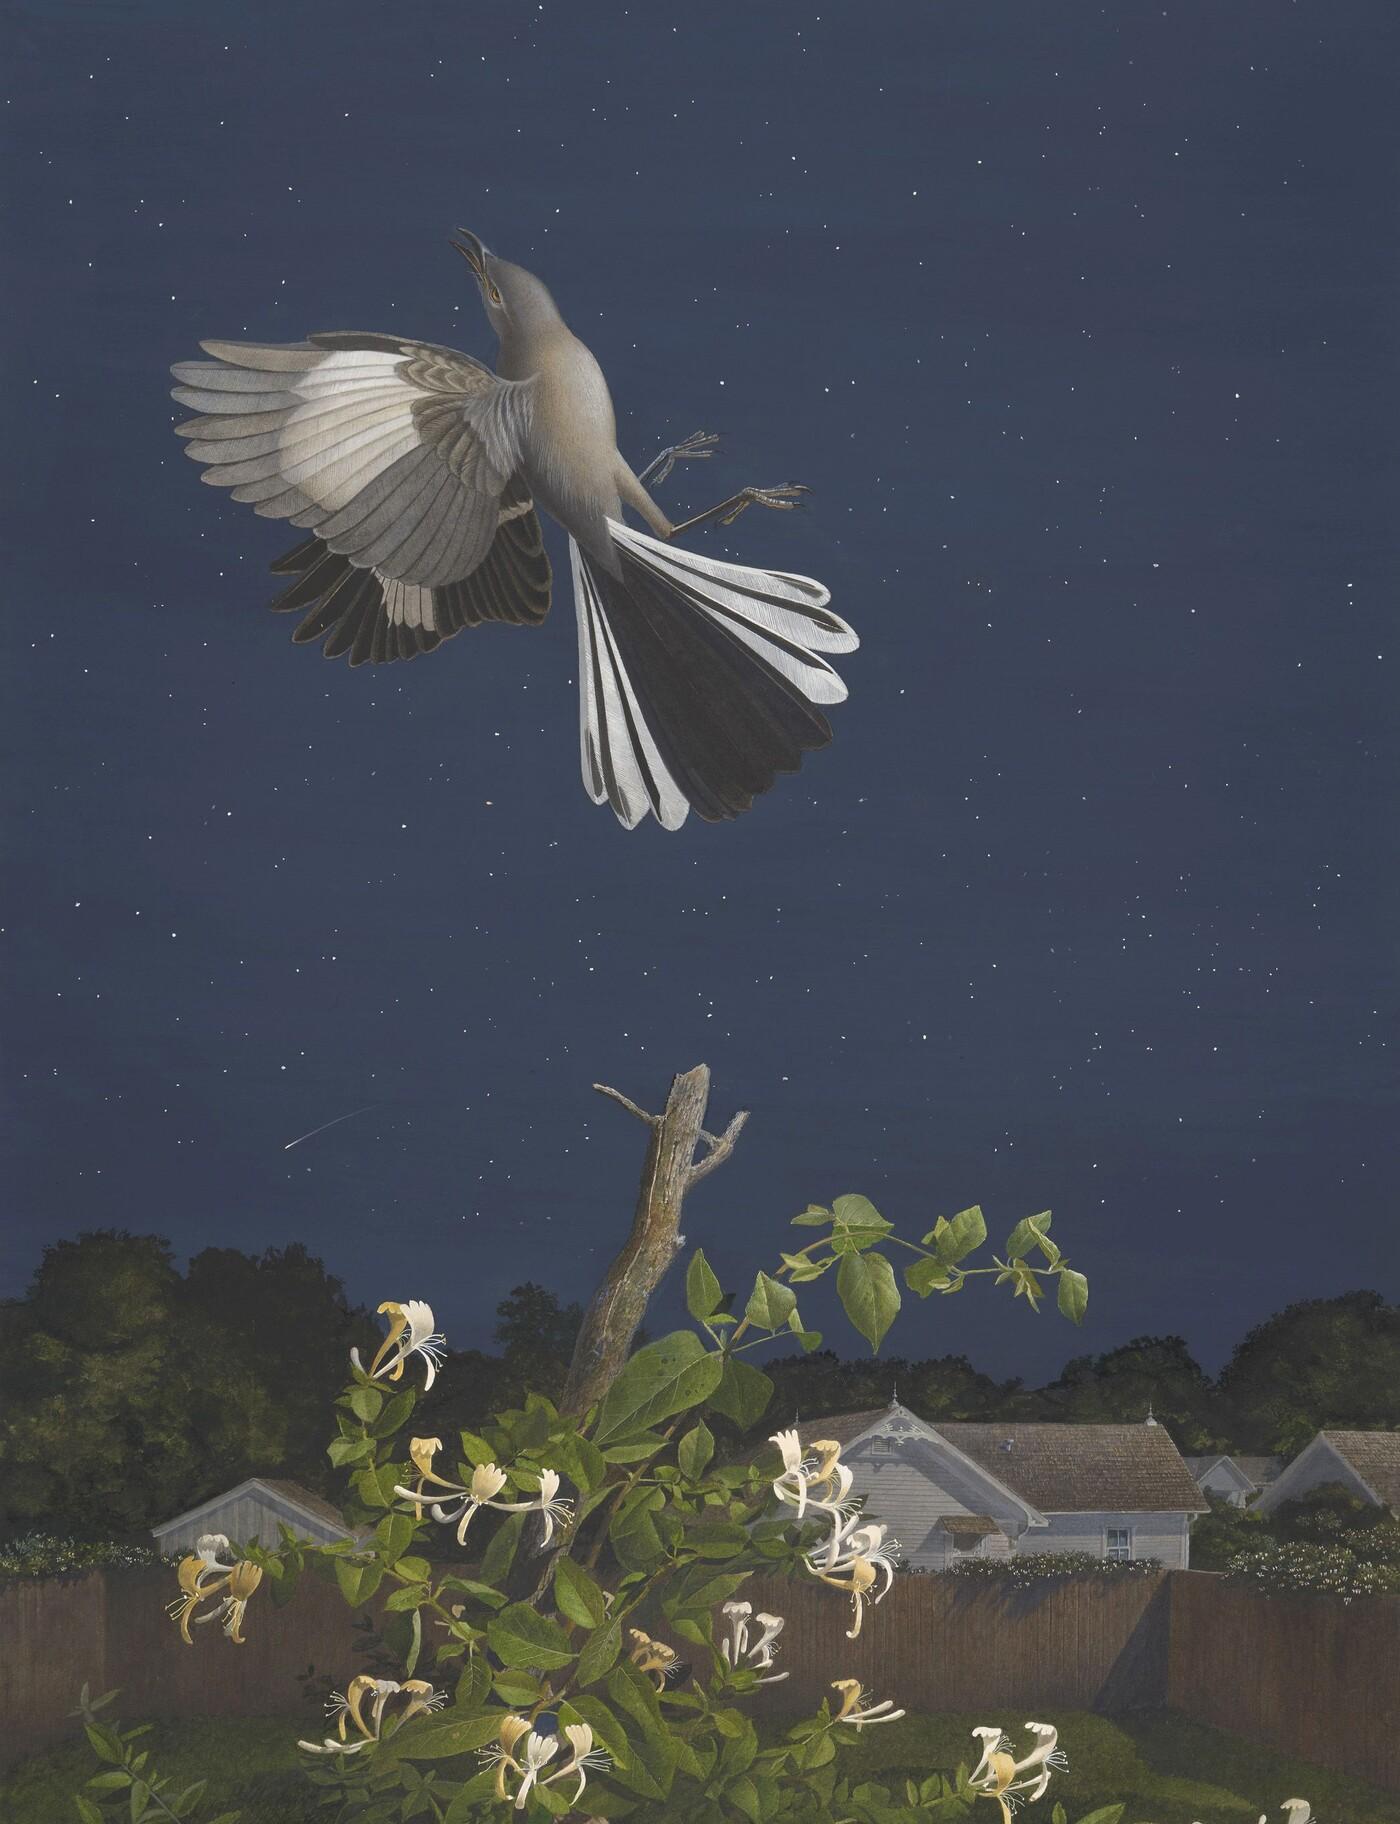 Scott Gentling (1942–2011), Stuart Gentling (1942–2006), Mockingbird, June 16, 1985